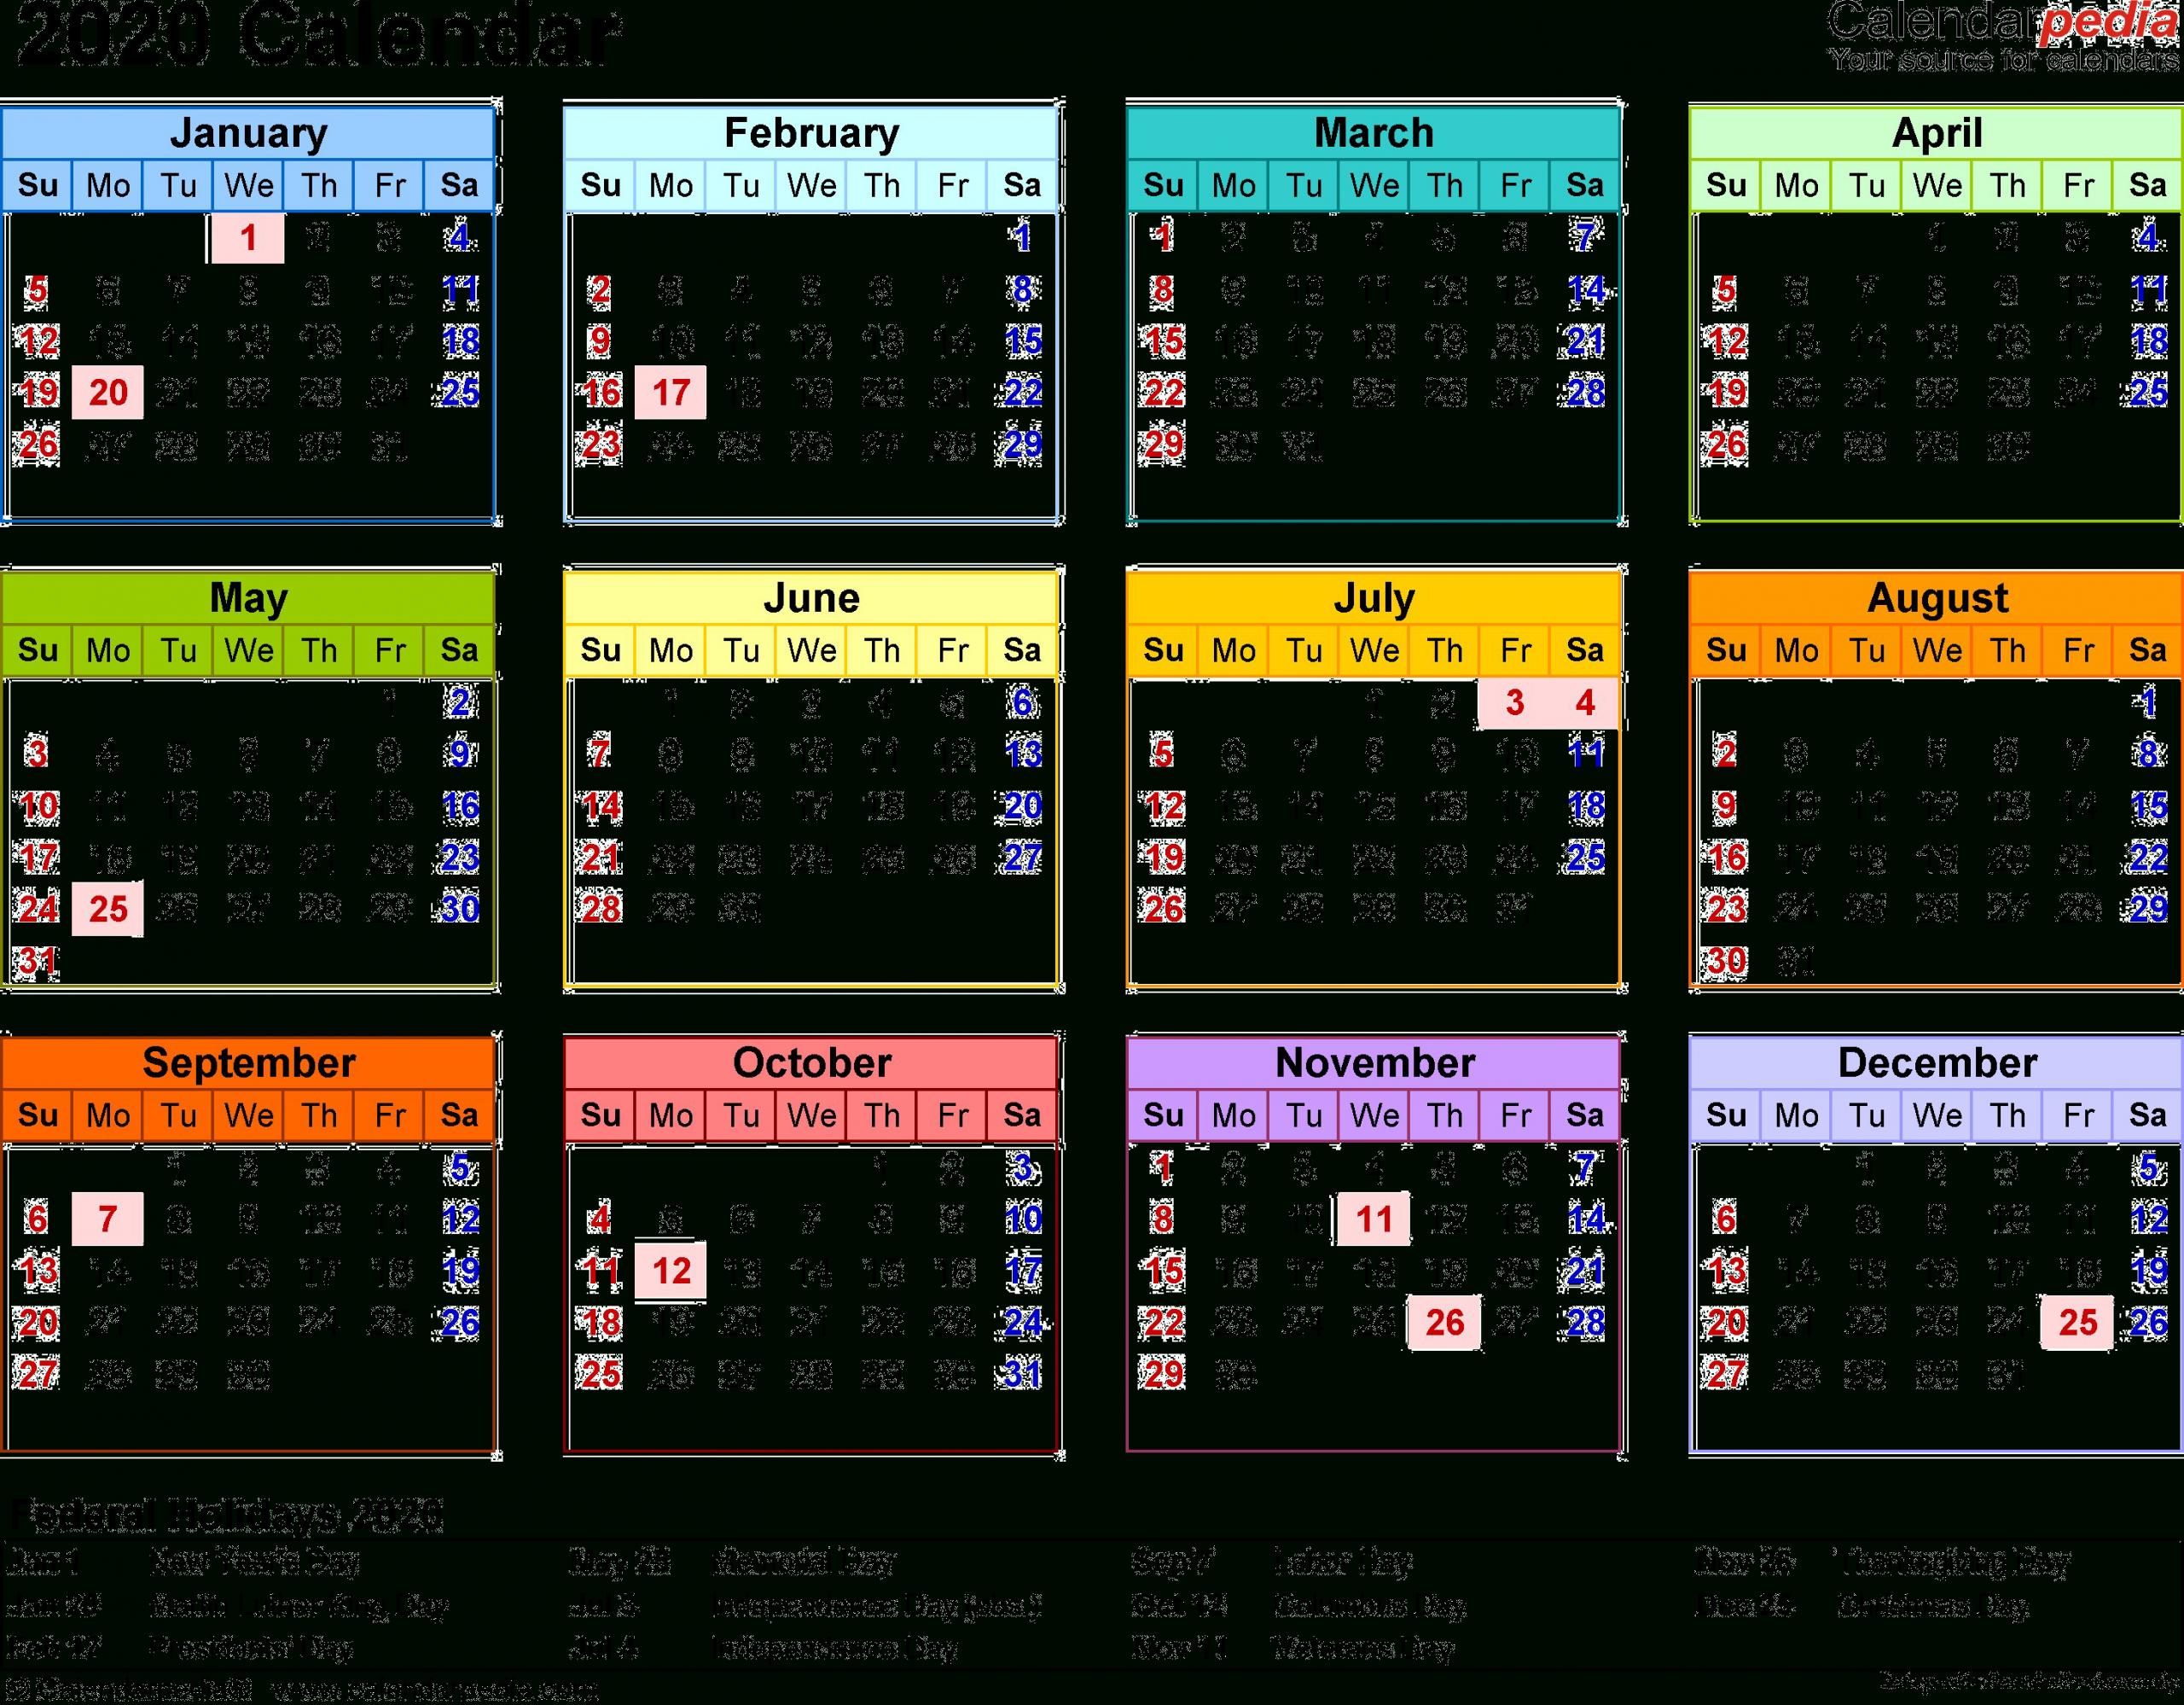 2020 Calendar Png Transparent Images   Png All